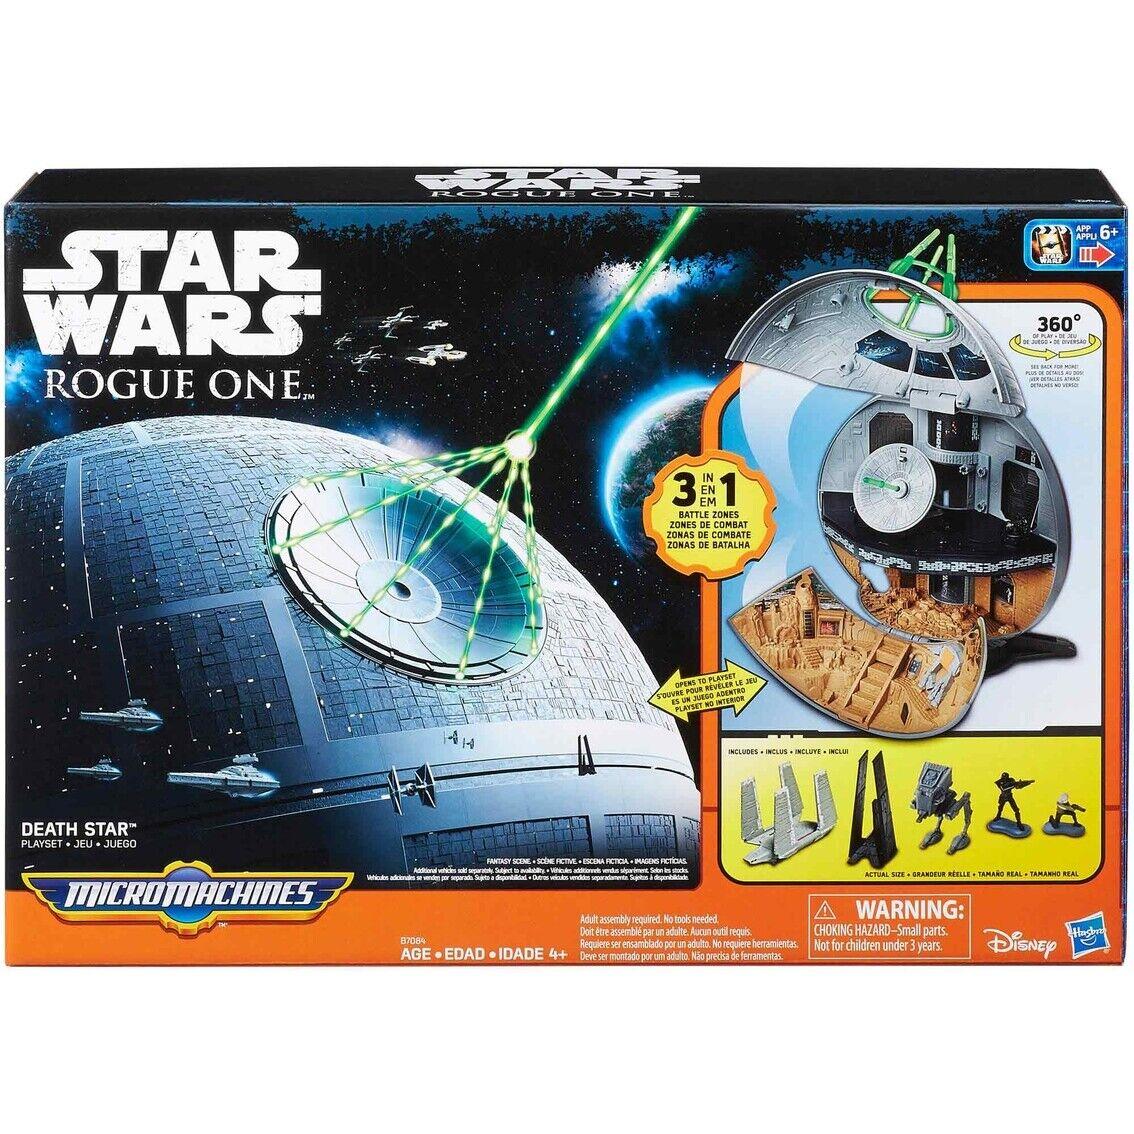 Hasbro Star Wars Rogue One Micro Machines Death Star Playset